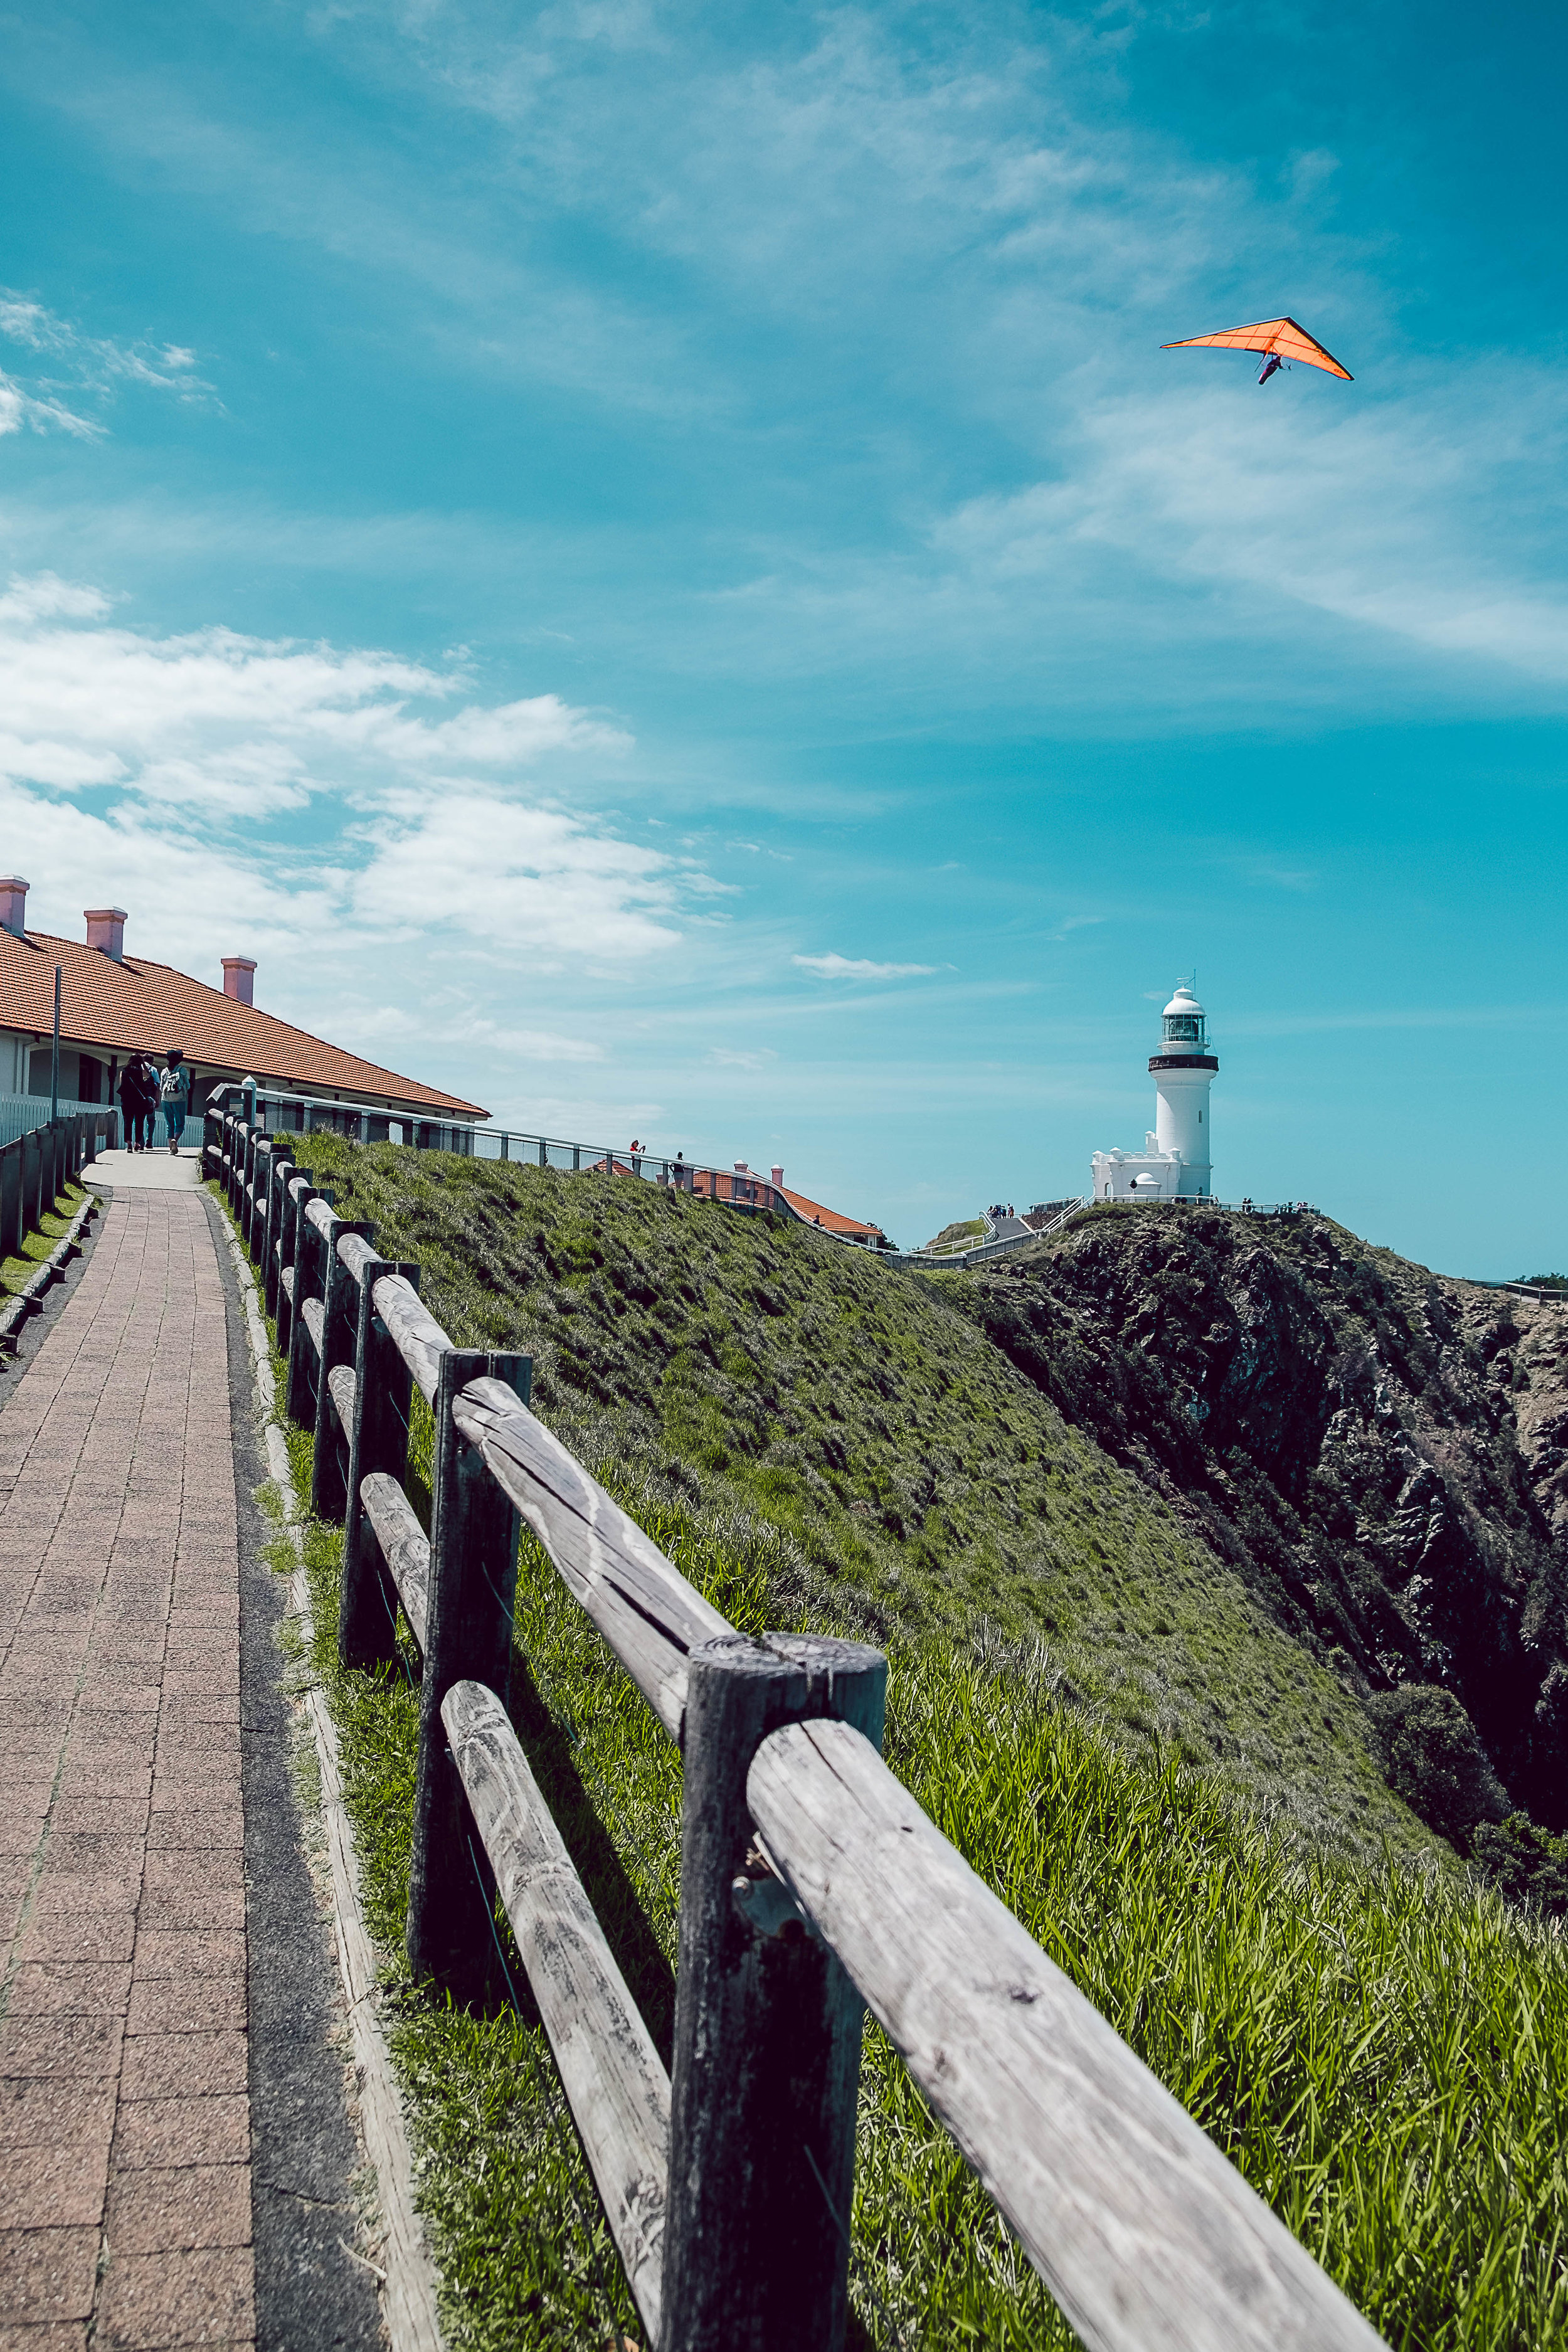 Rachel Off Duty: Byron Bay - 1 Day - Cape Byron Lighthouse